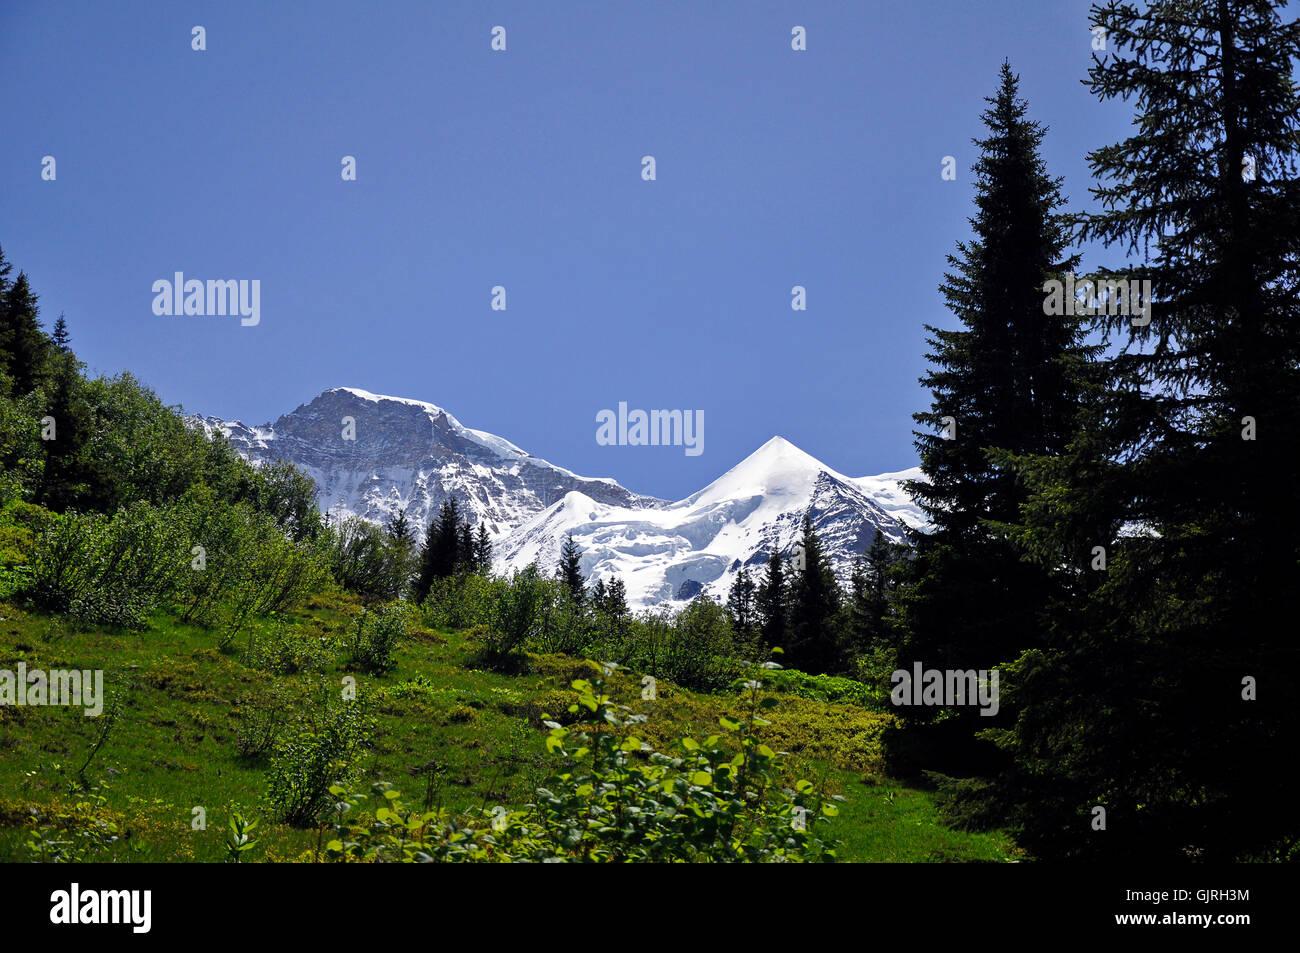 mountains alps alp - Stock Image